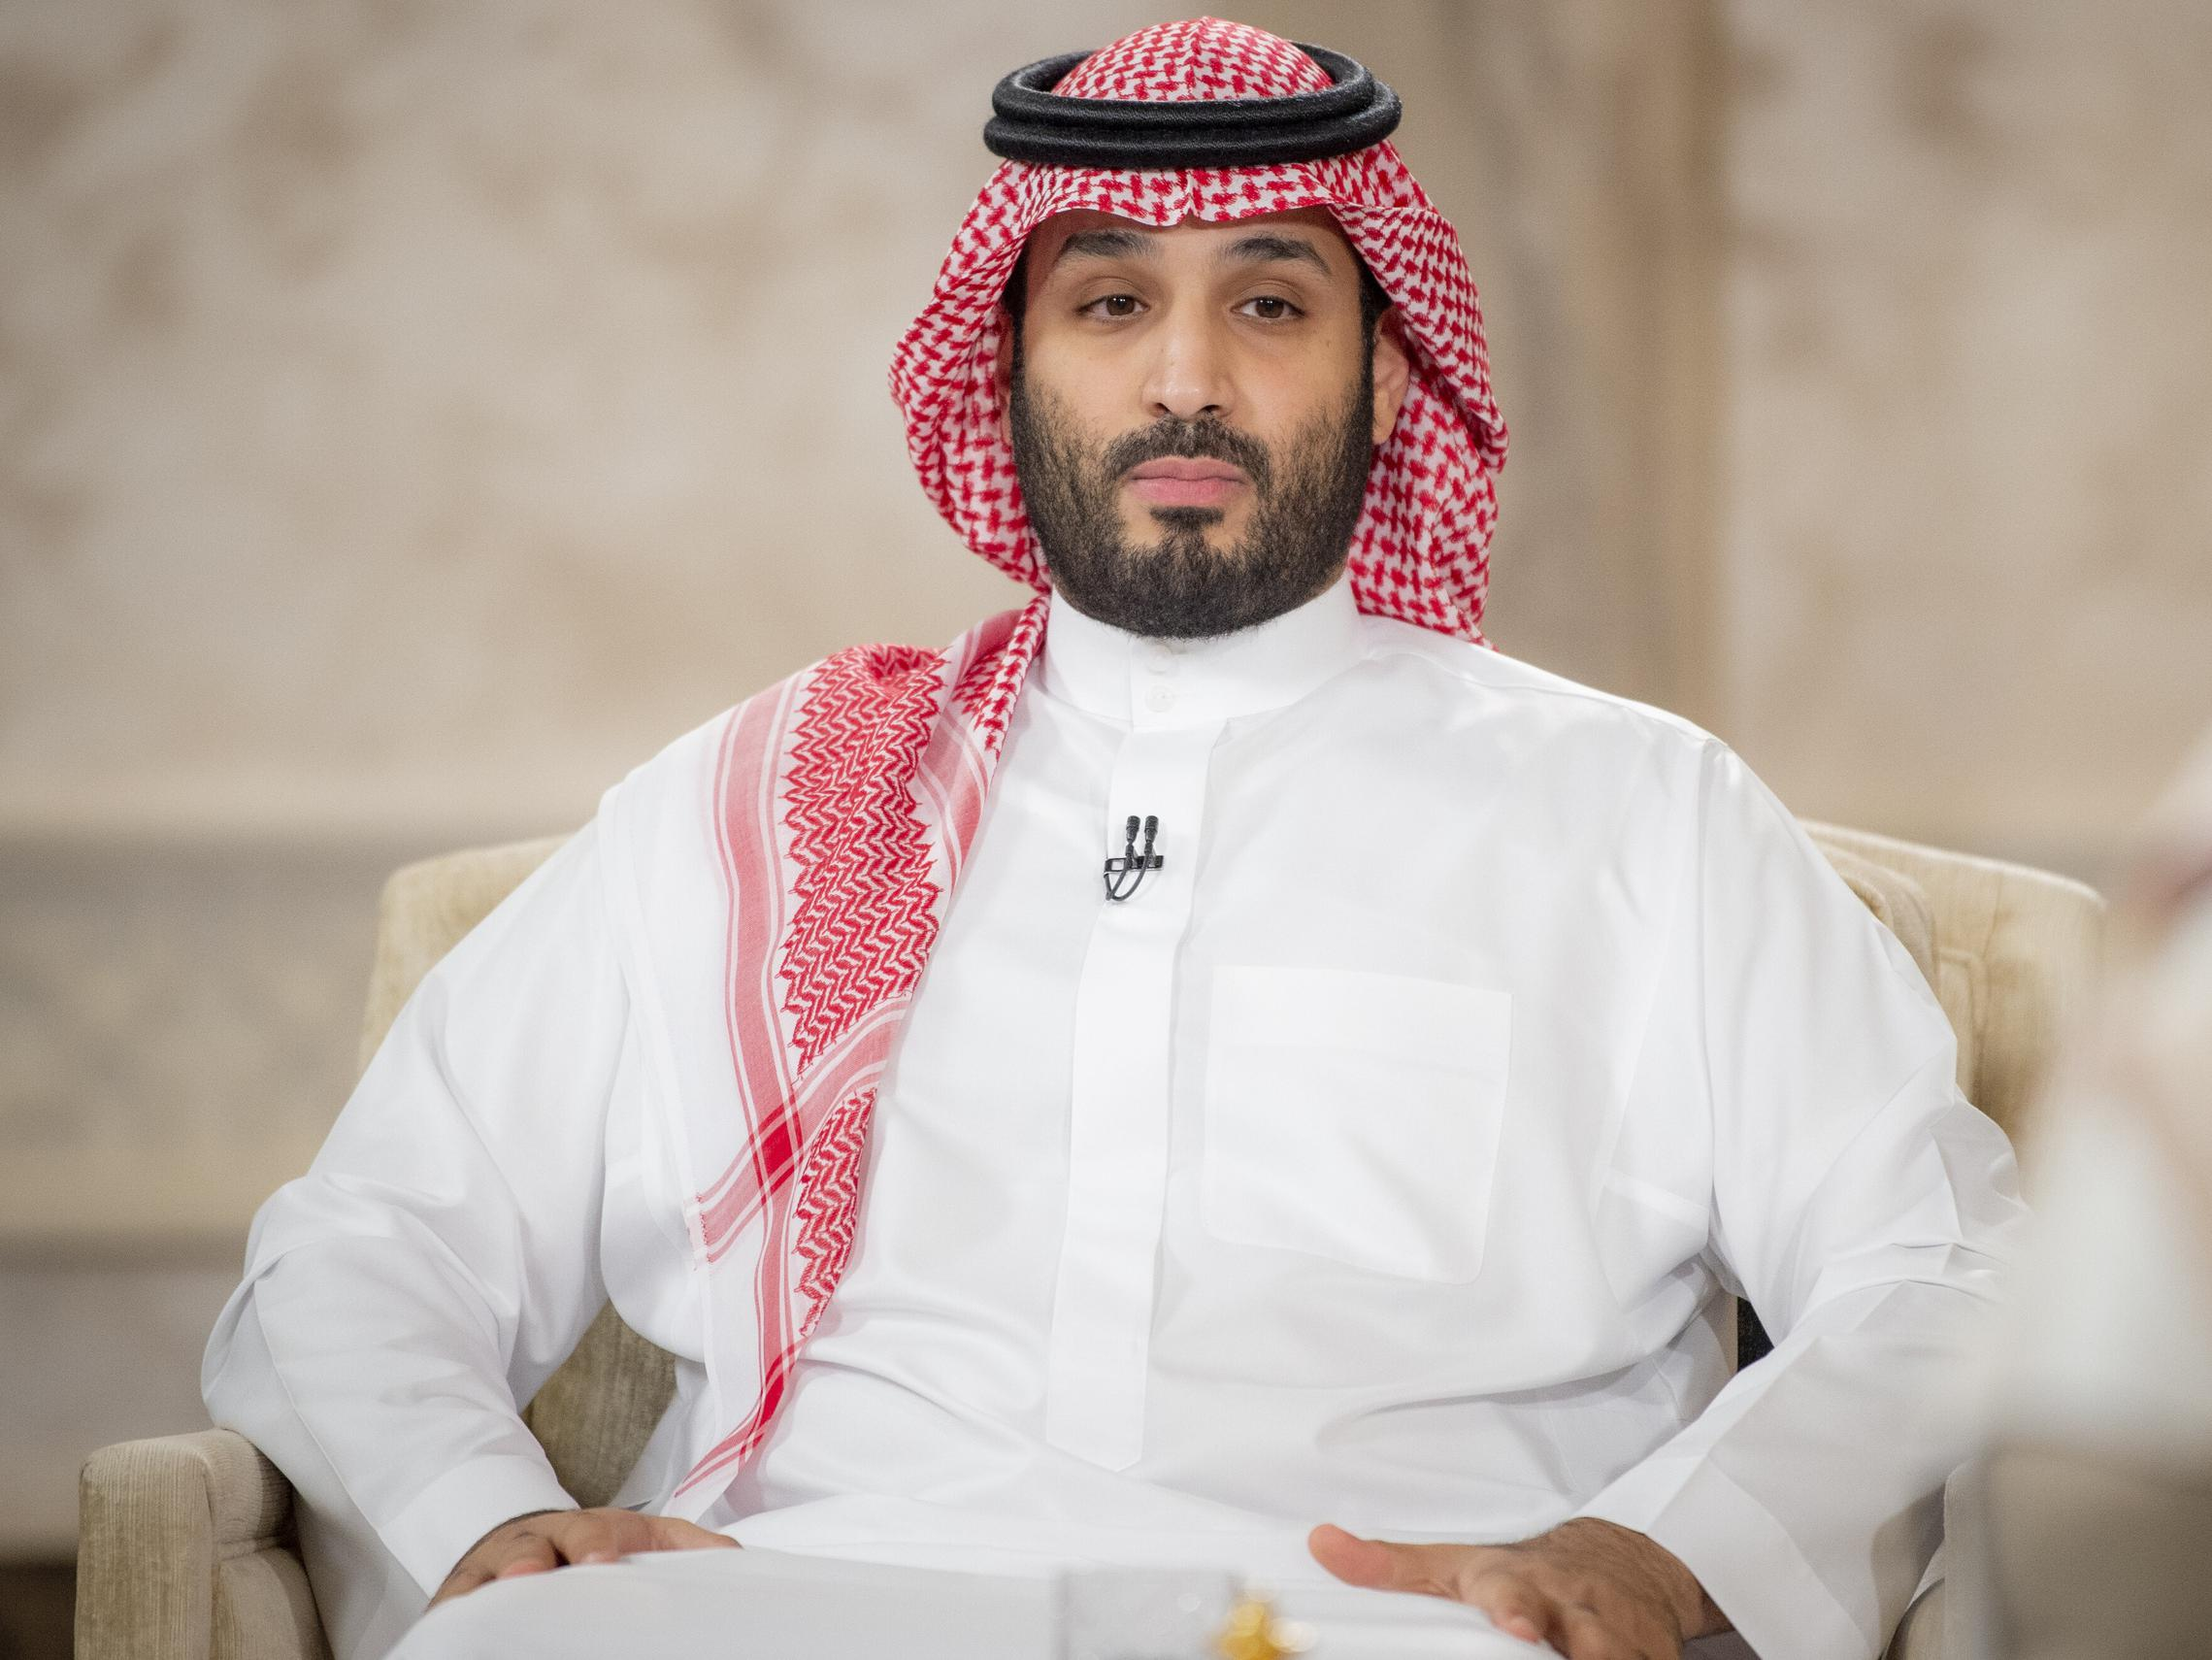 Crown Prince of Saudi Arabia Mohammed bin Salman